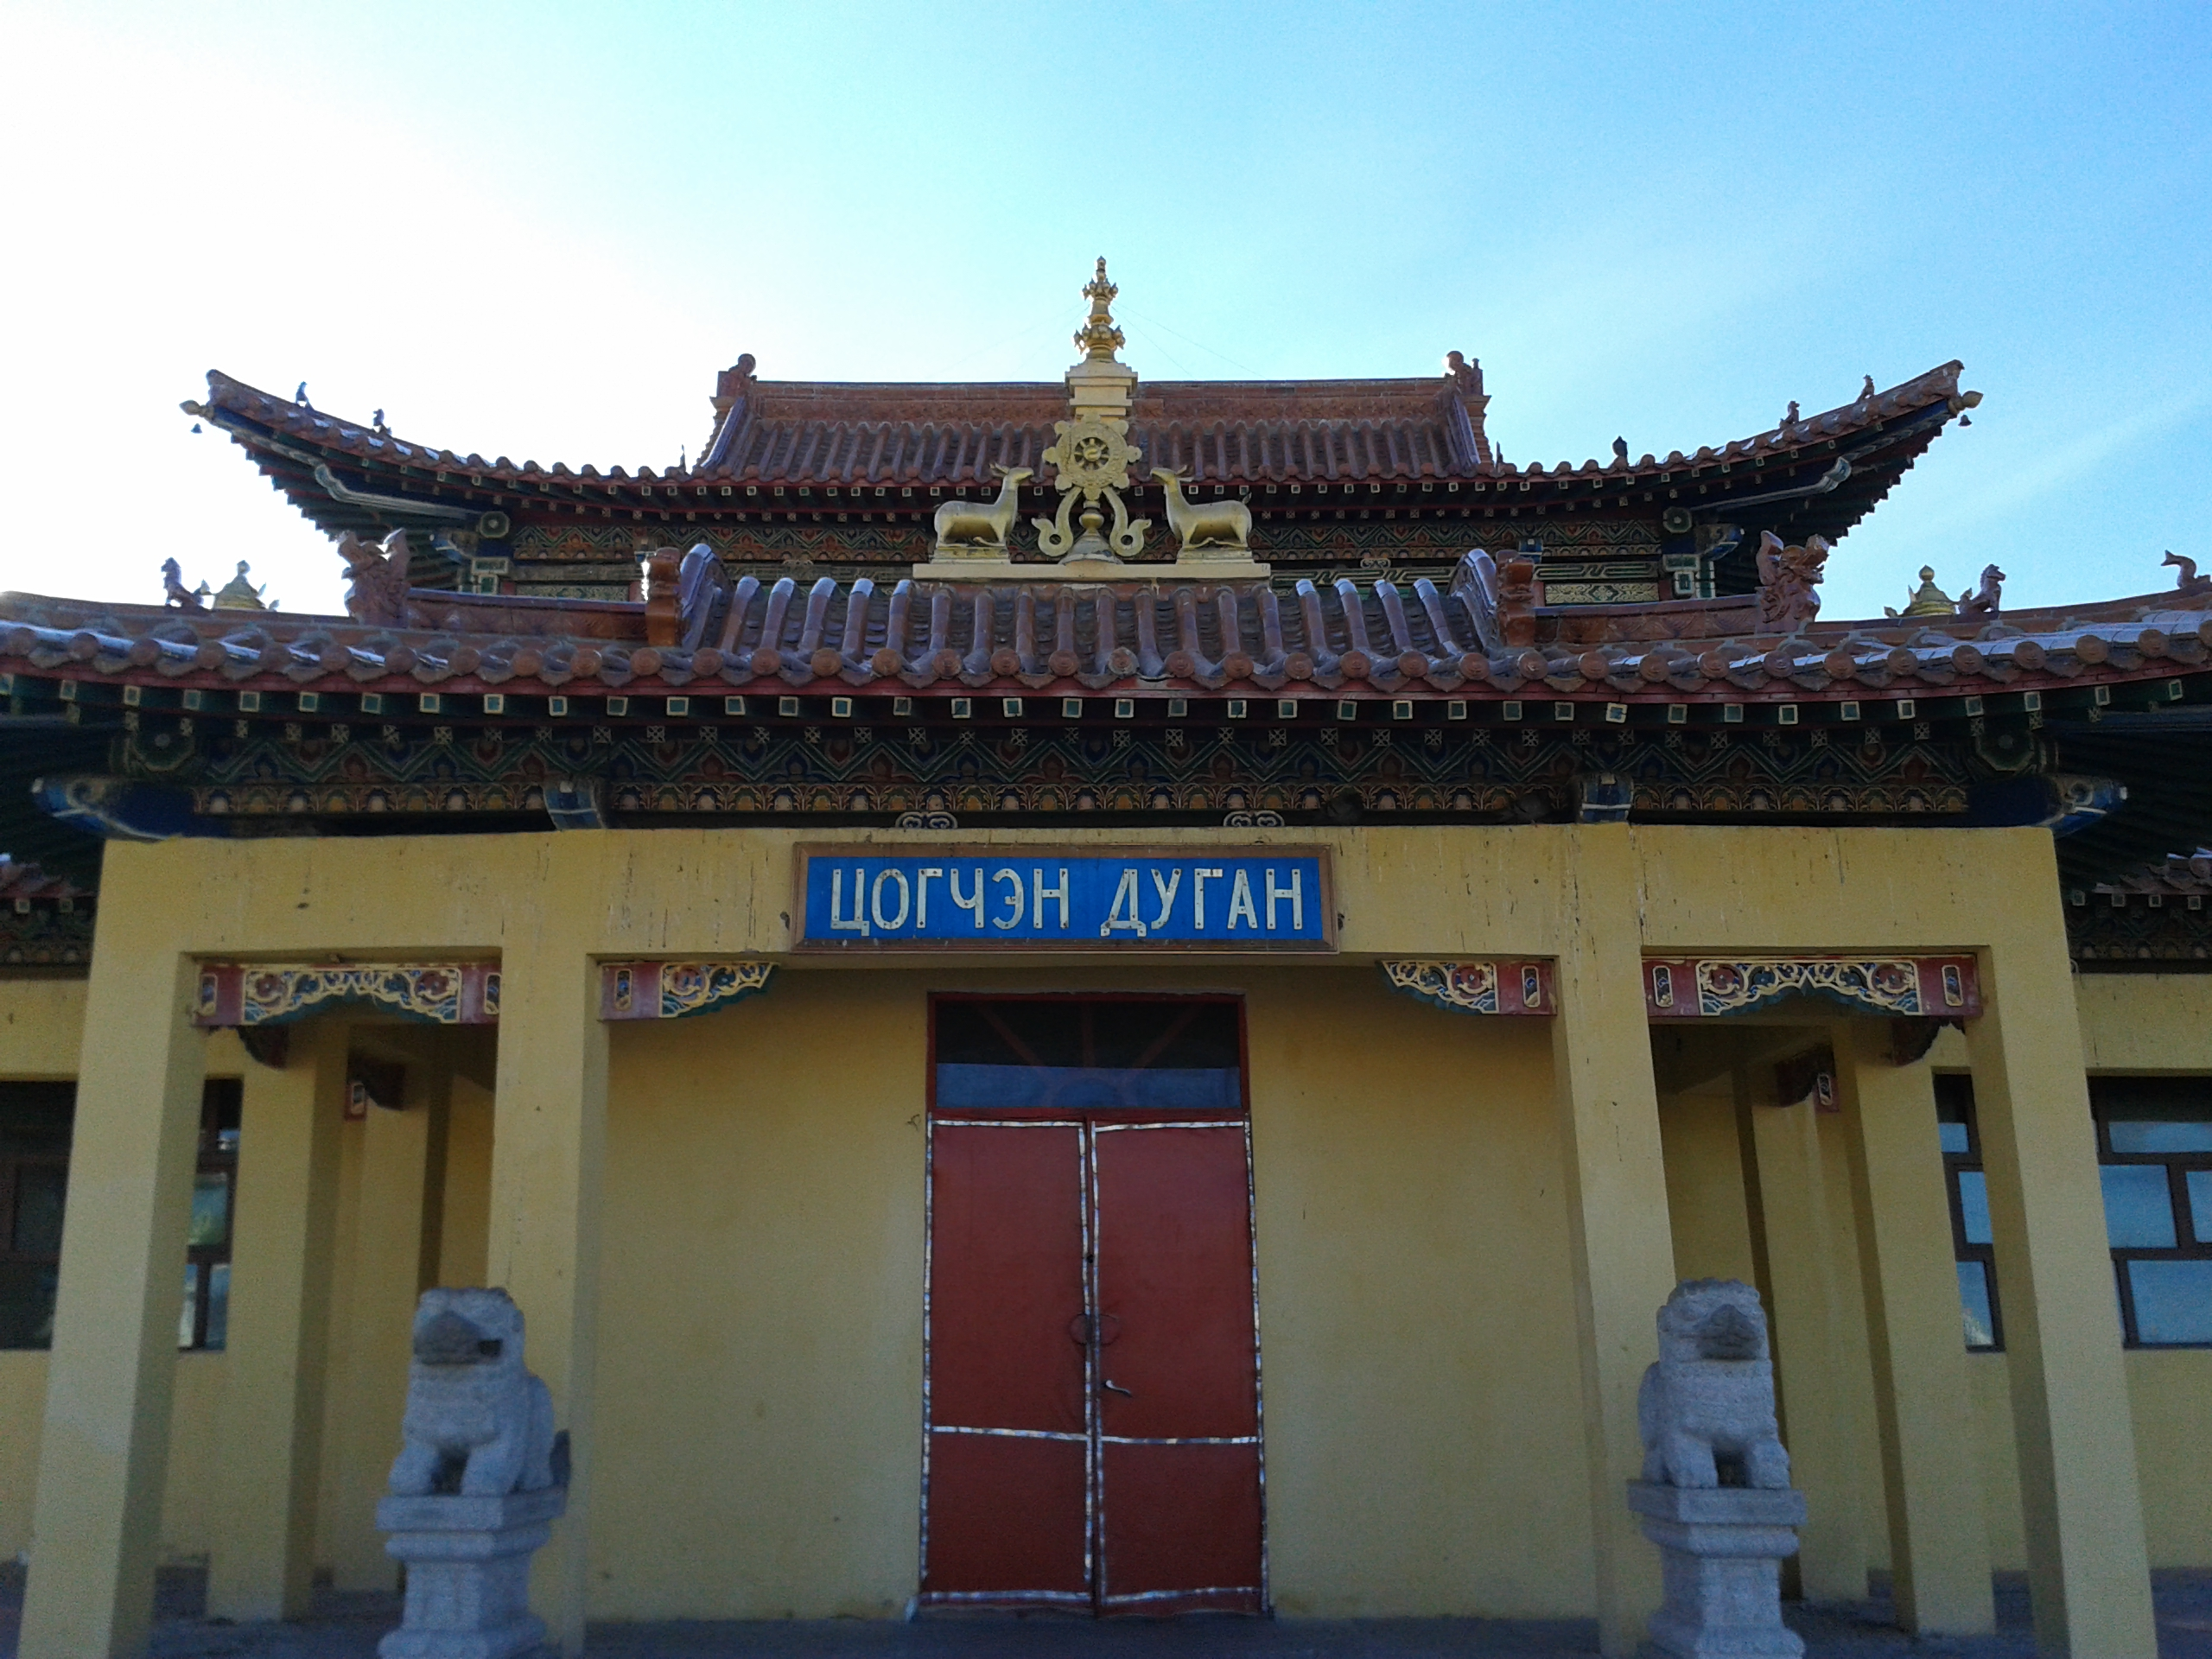 Буддистские монастыри Монголиист